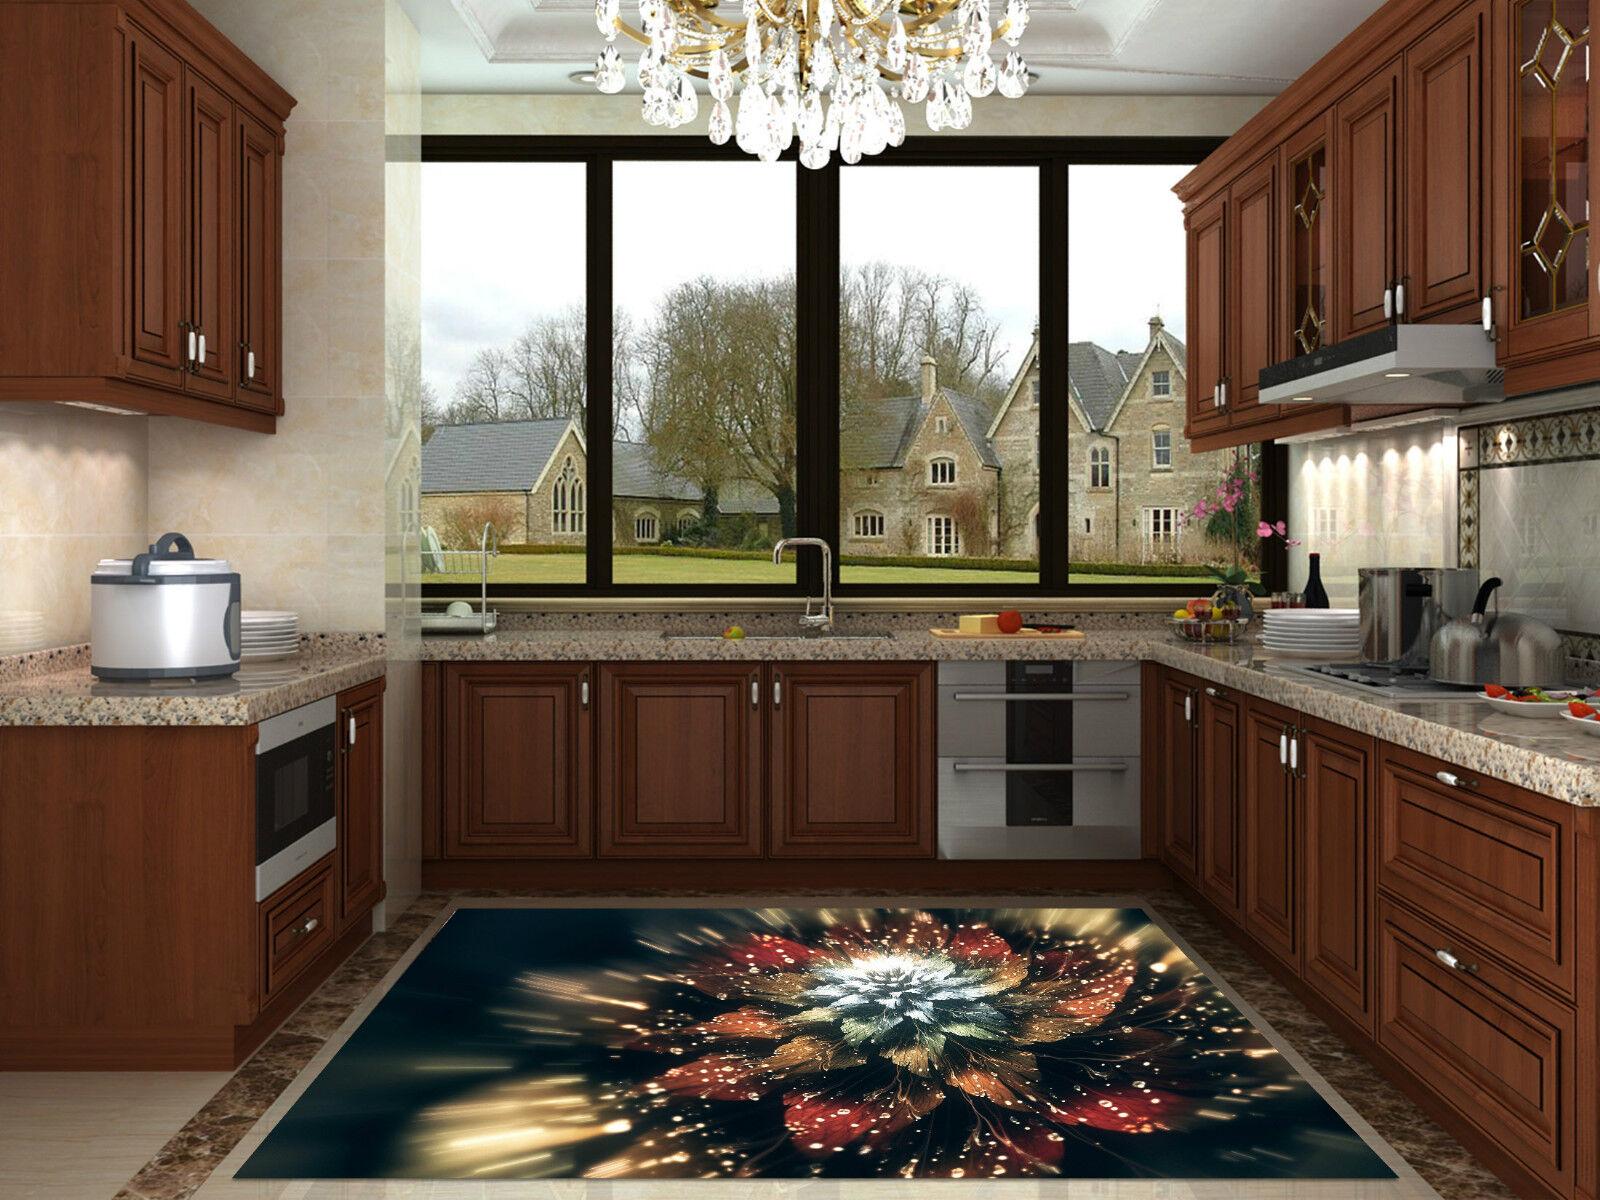 3D Shiny Flower 27 Kitchen Mat Floor Mural Wall Print Wall Deco AJ WALLPAPER CA